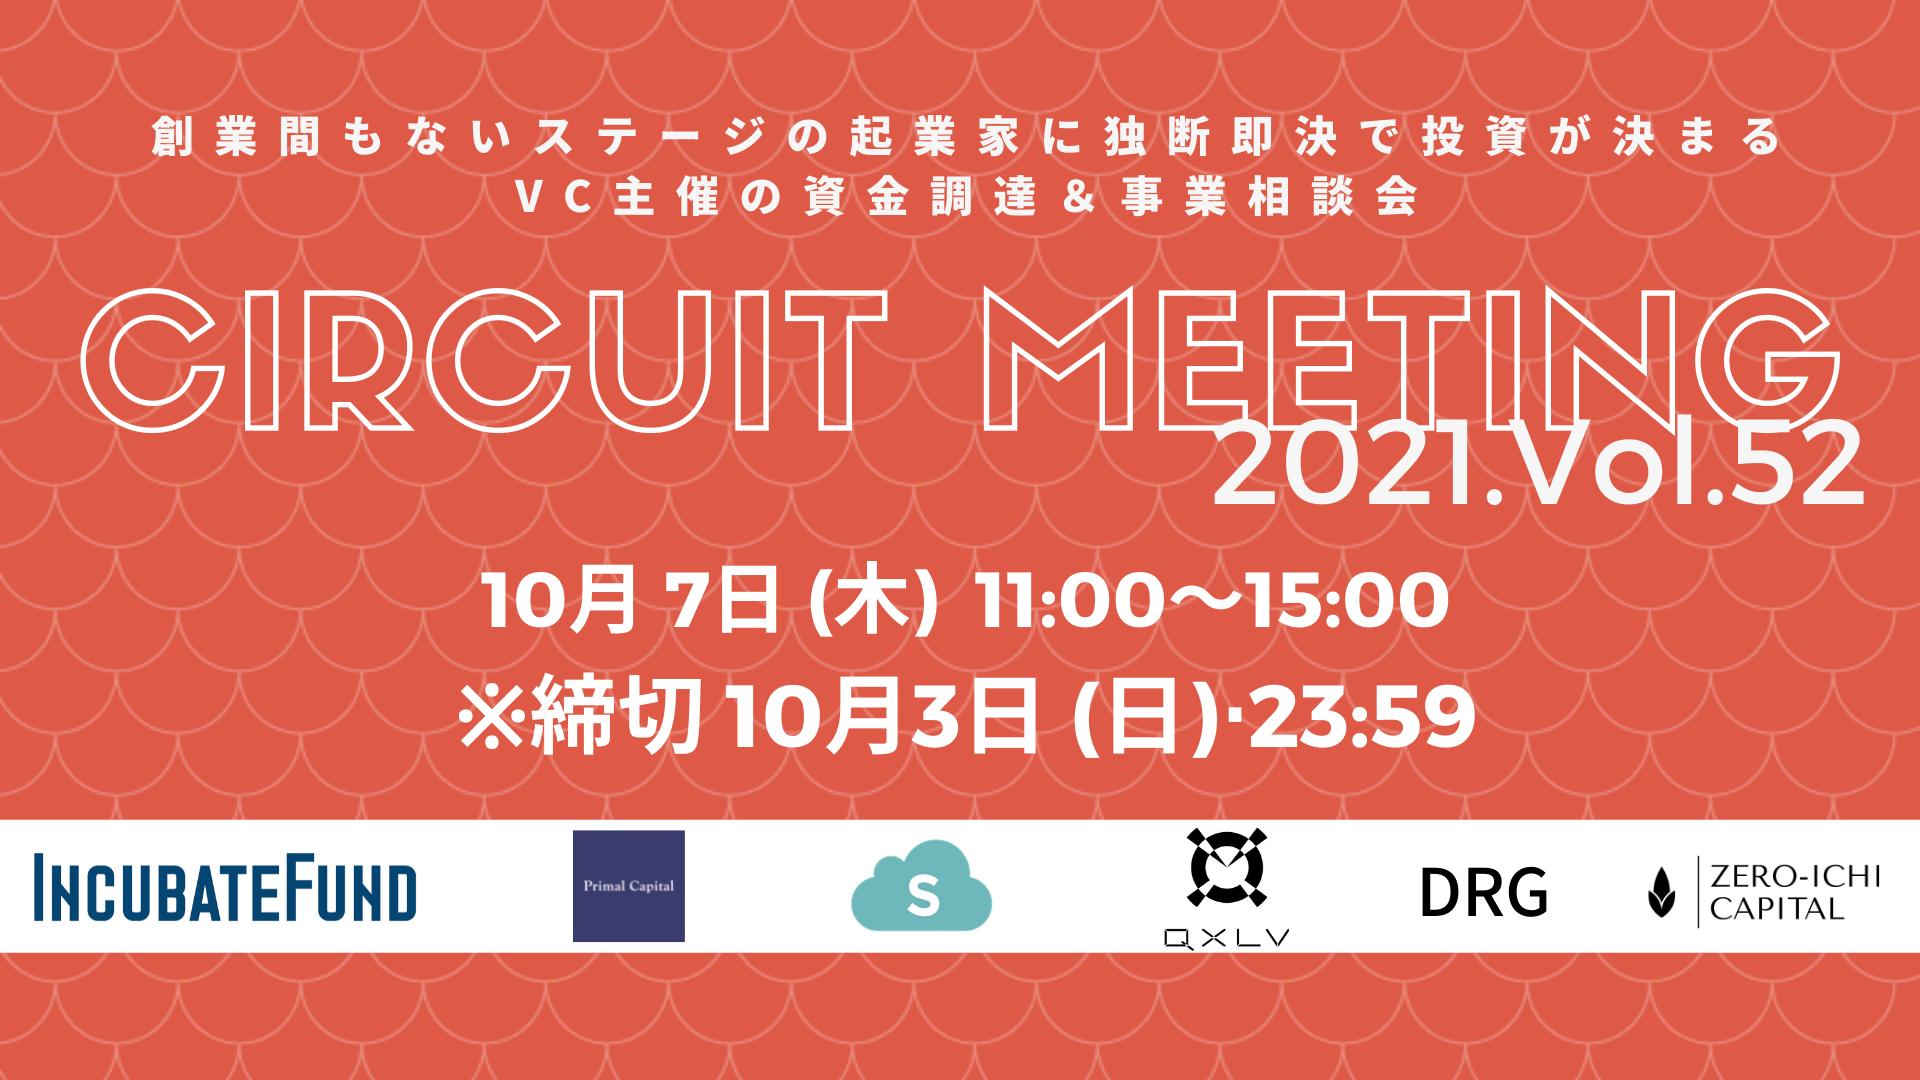 【10/3締切】Circuit Meeting Vol.52